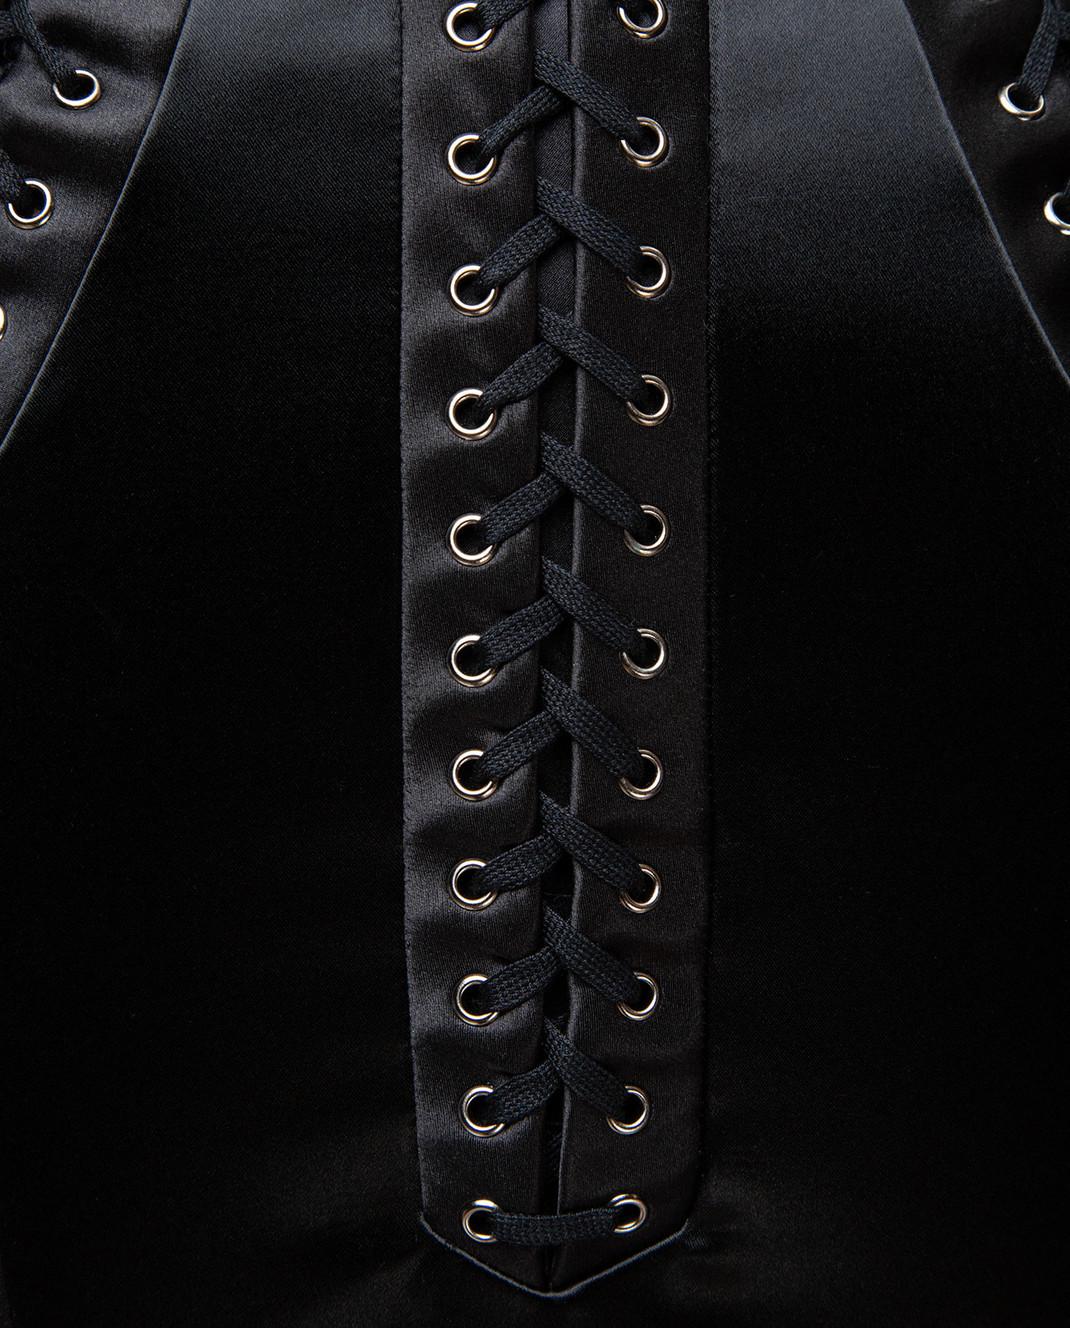 Dolce&Gabbana Черная юбка F4BHKTFURAD изображение 5